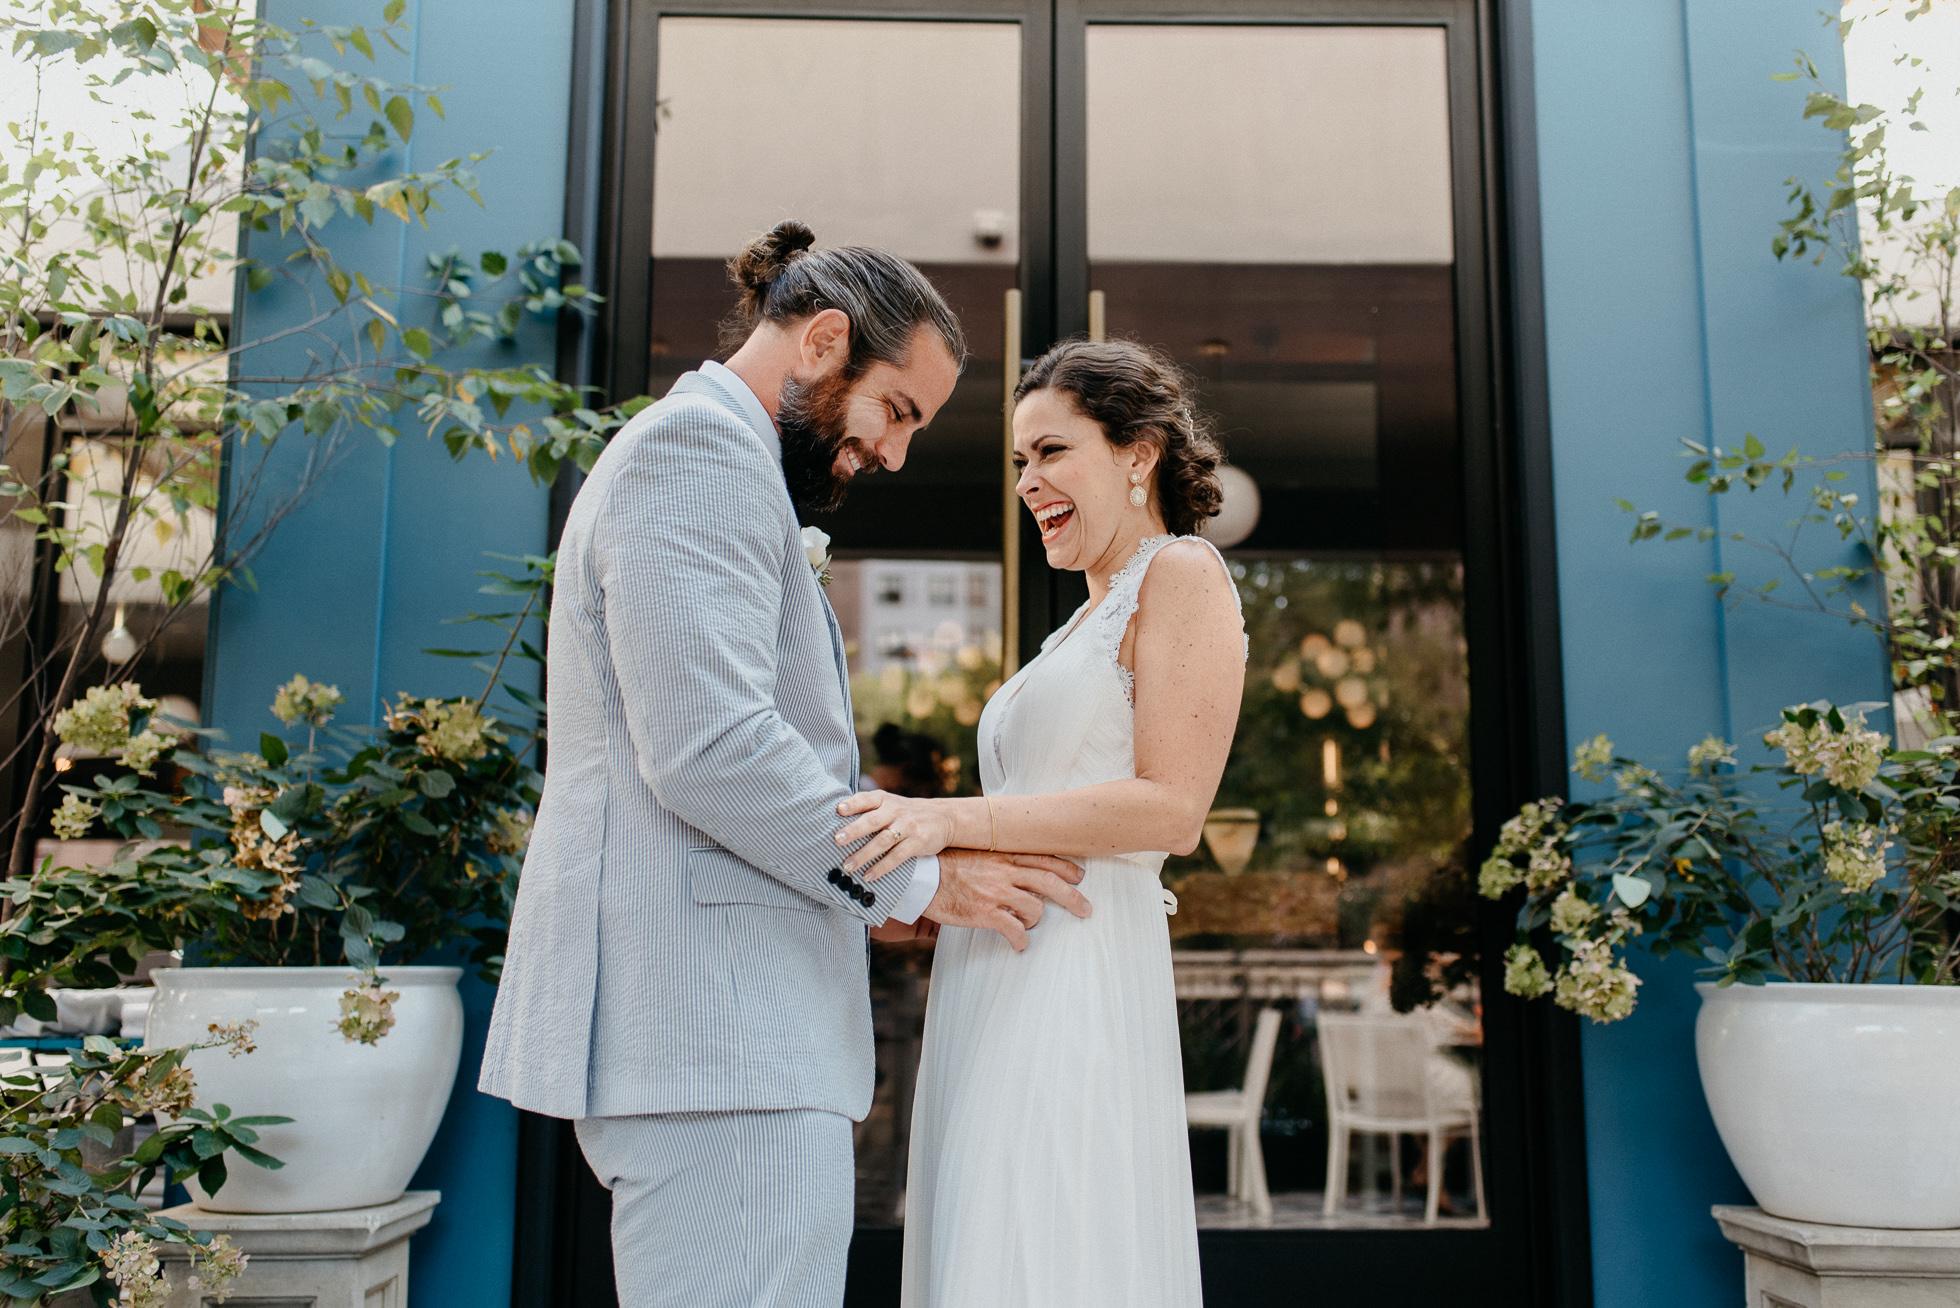 New York City creative wedding photographer